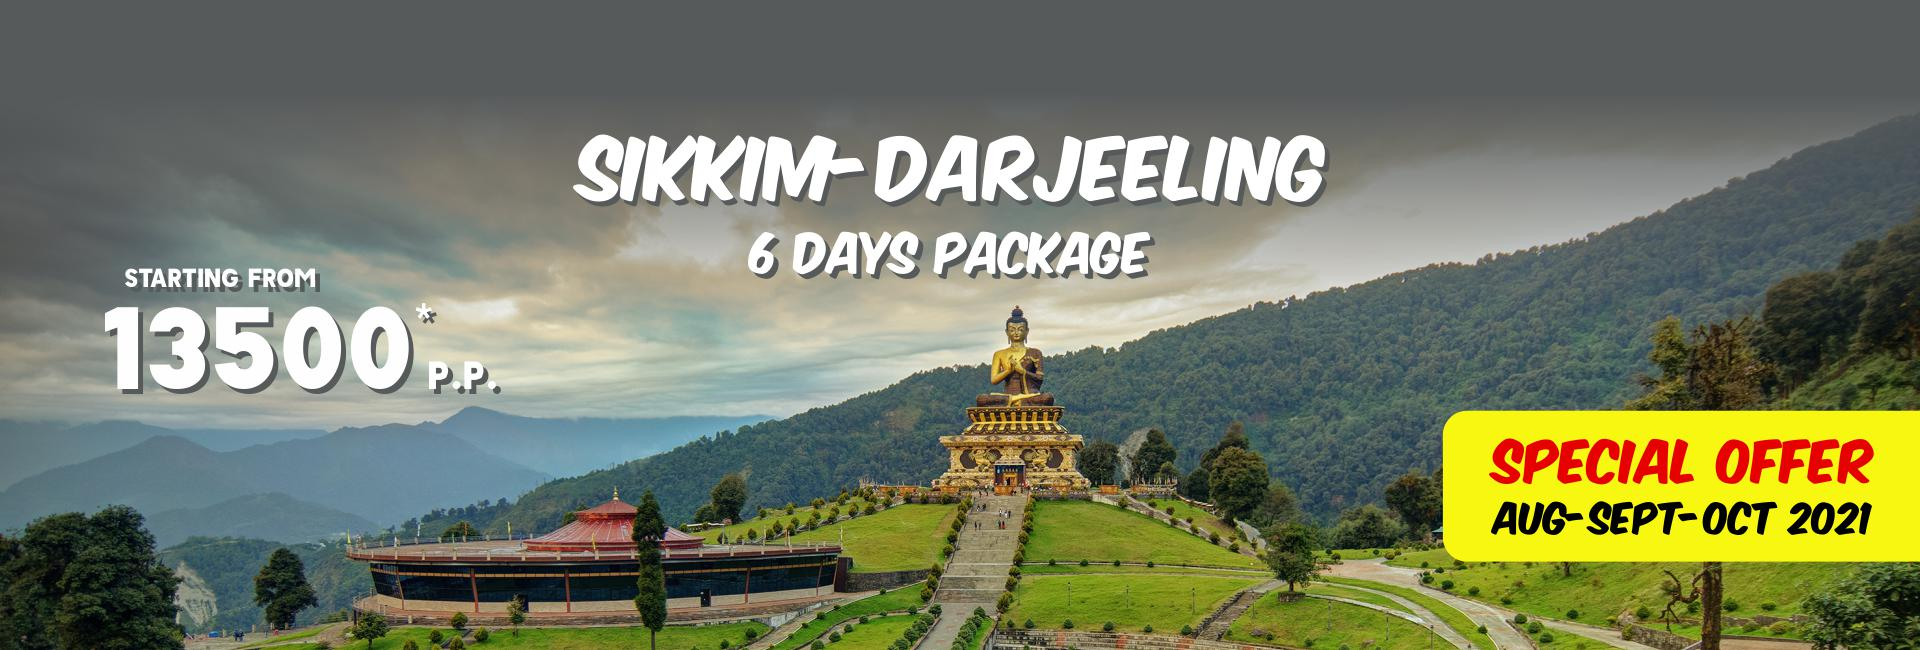 Sikkim-Darjeeling Tour Packages